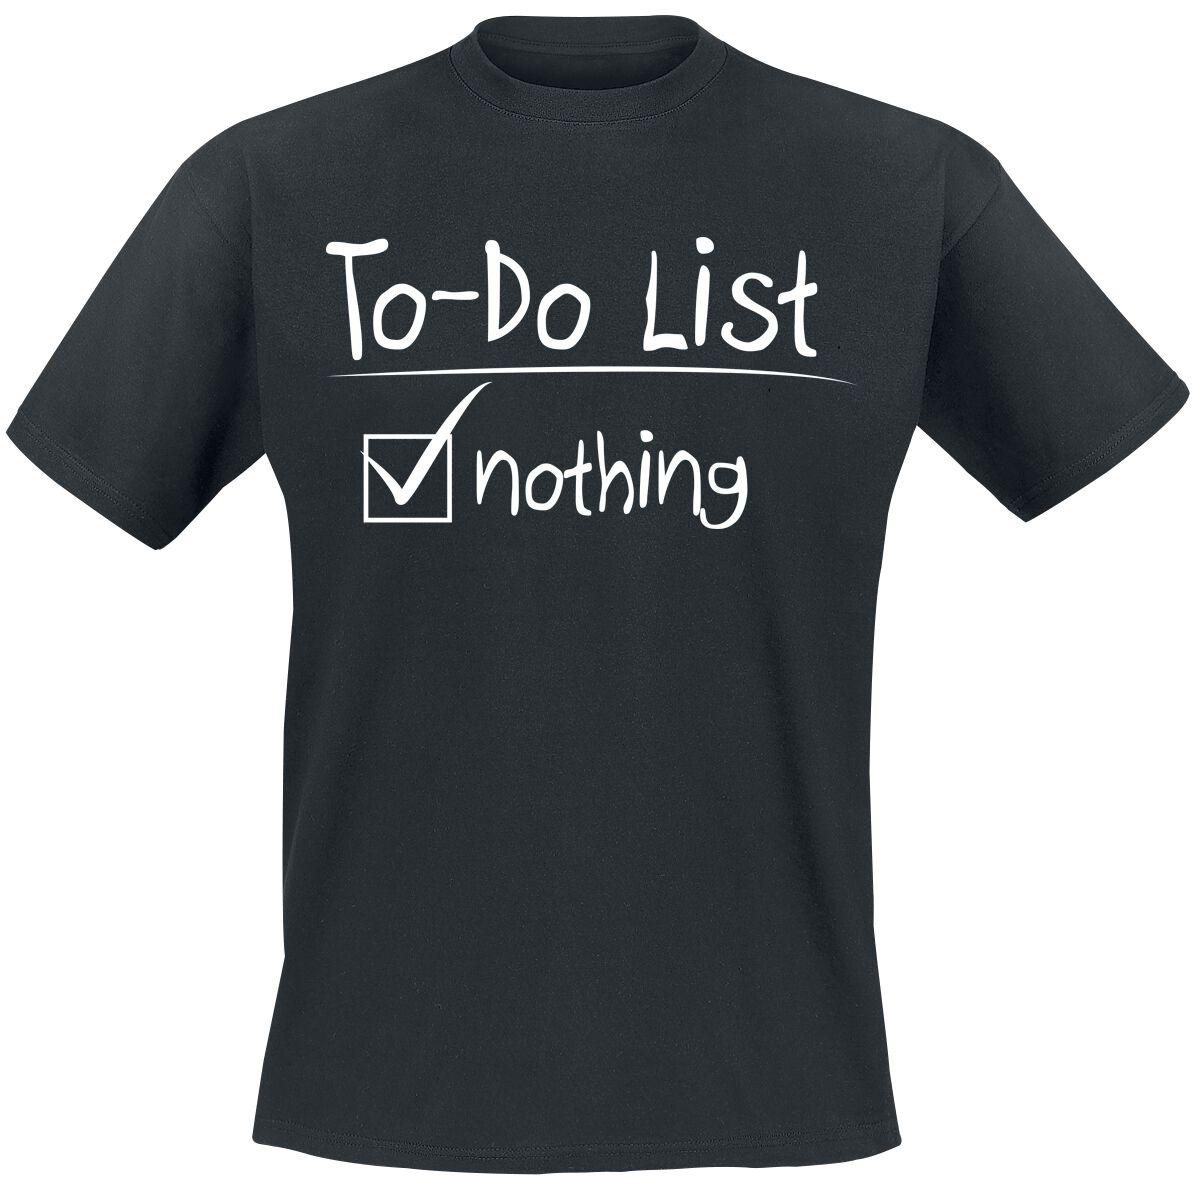 To-Do List T-Shirt black